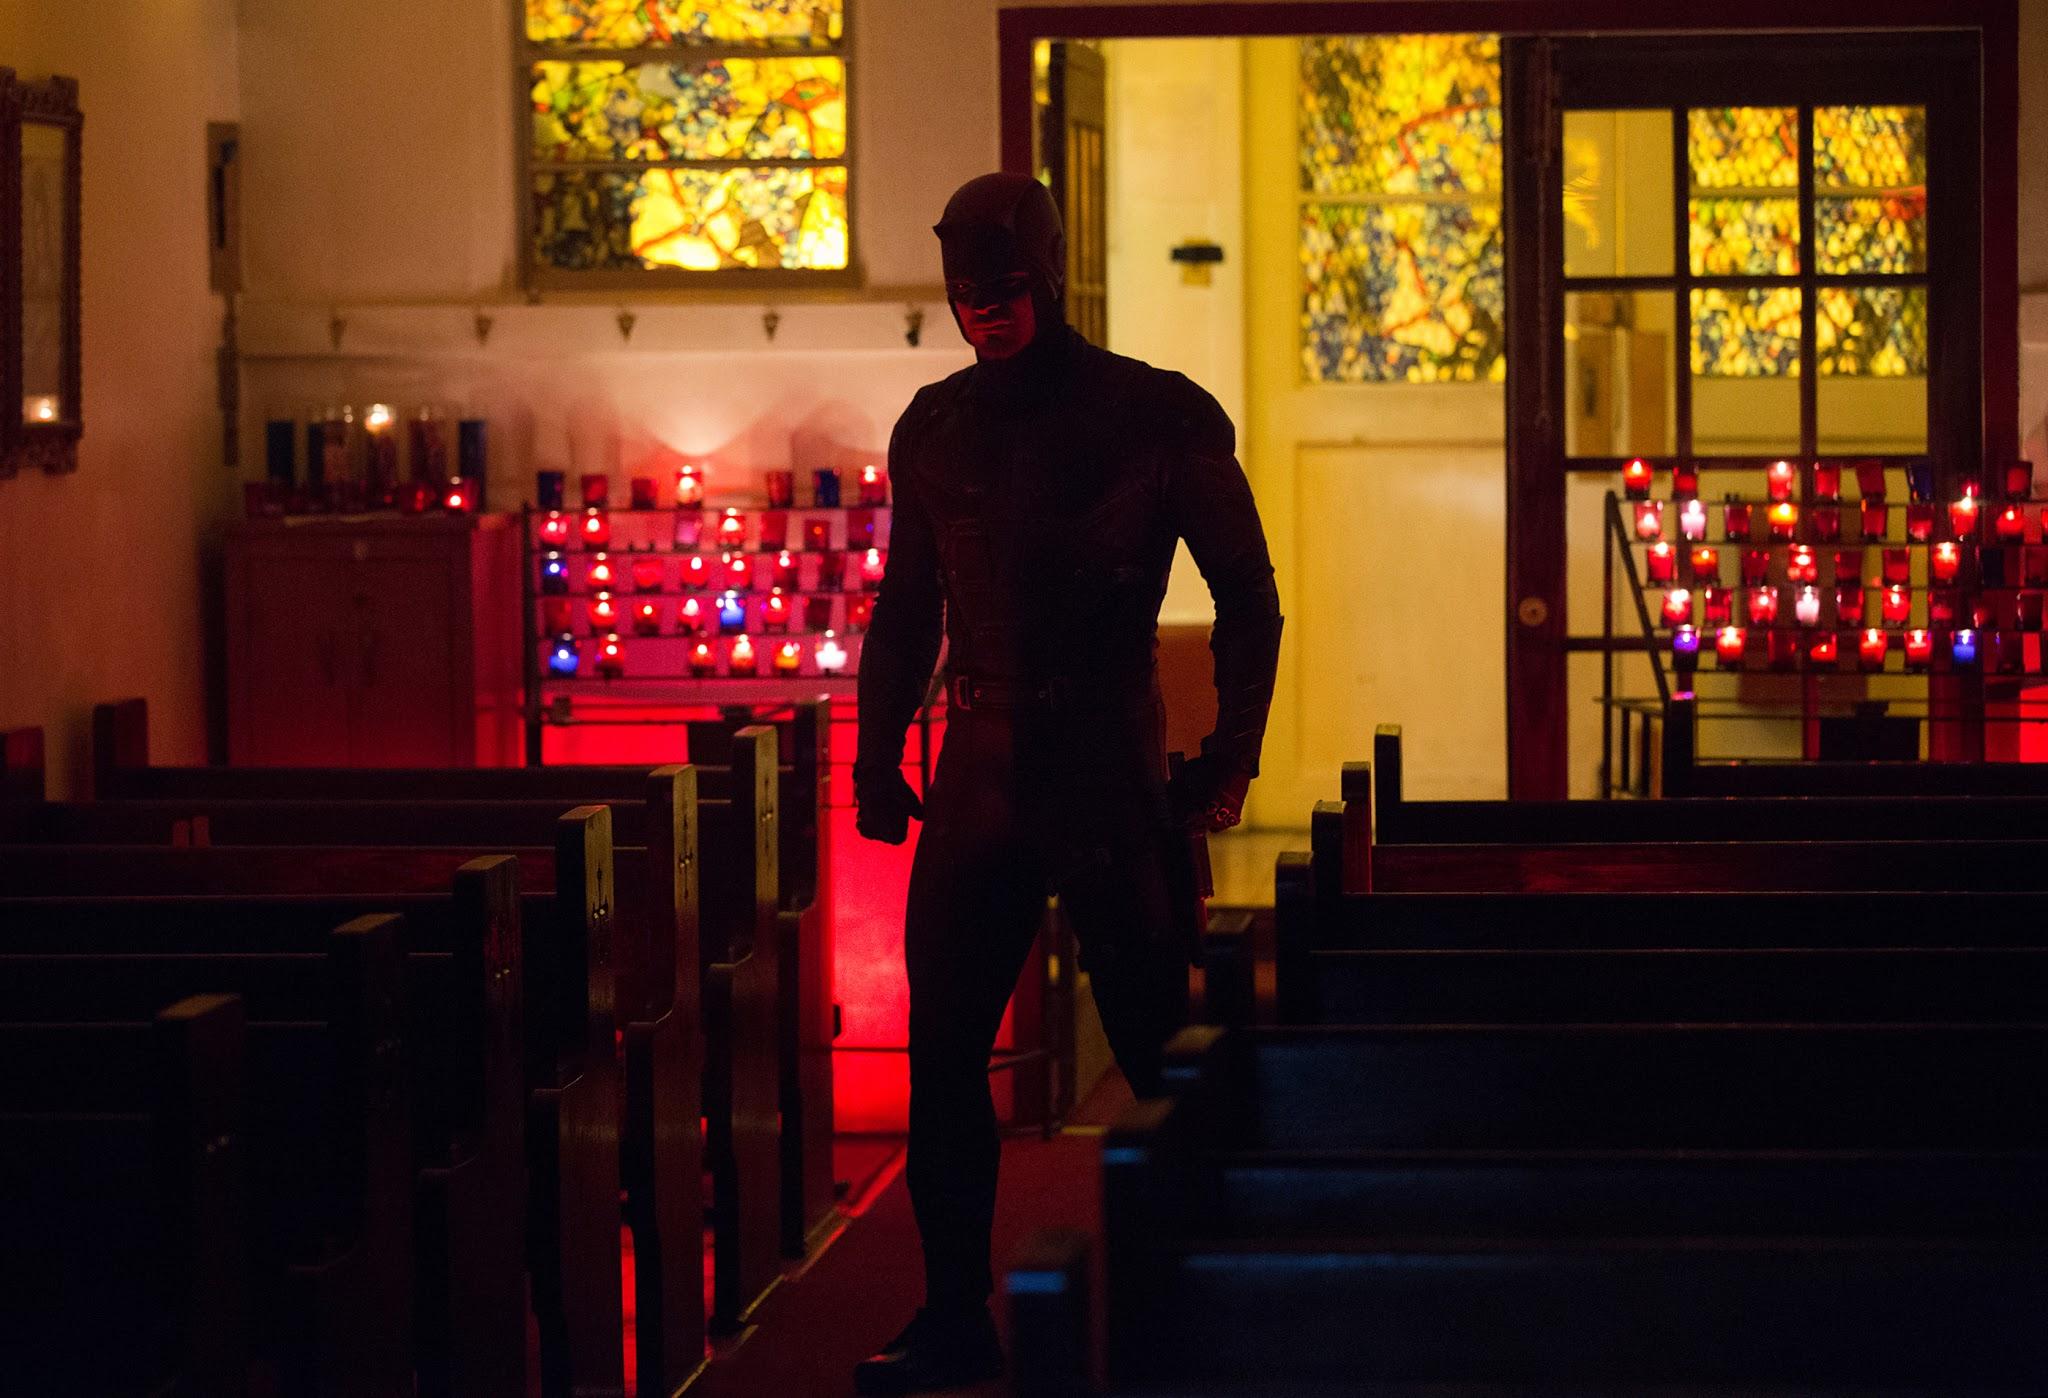 Daredevil Season 2 First Look: Elektra Looks Classy For Netflix's Storyline #35407